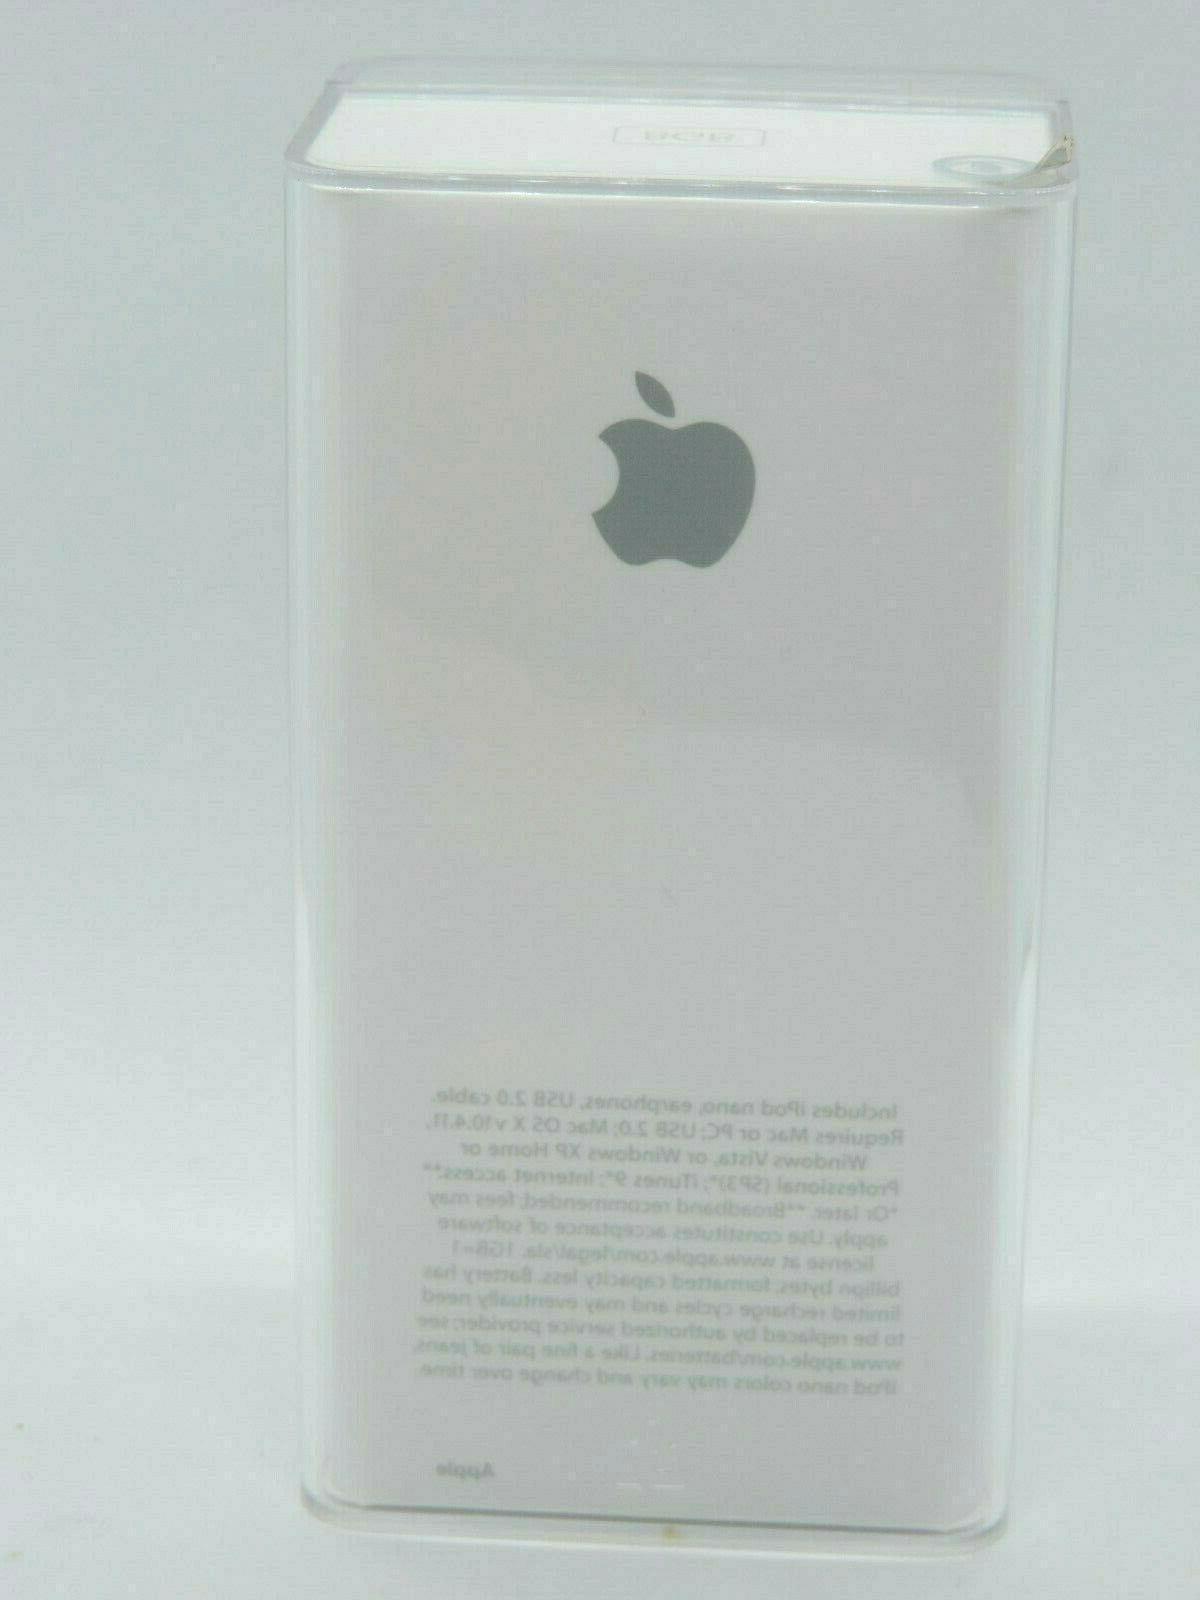 Apple Generation MP3 Player